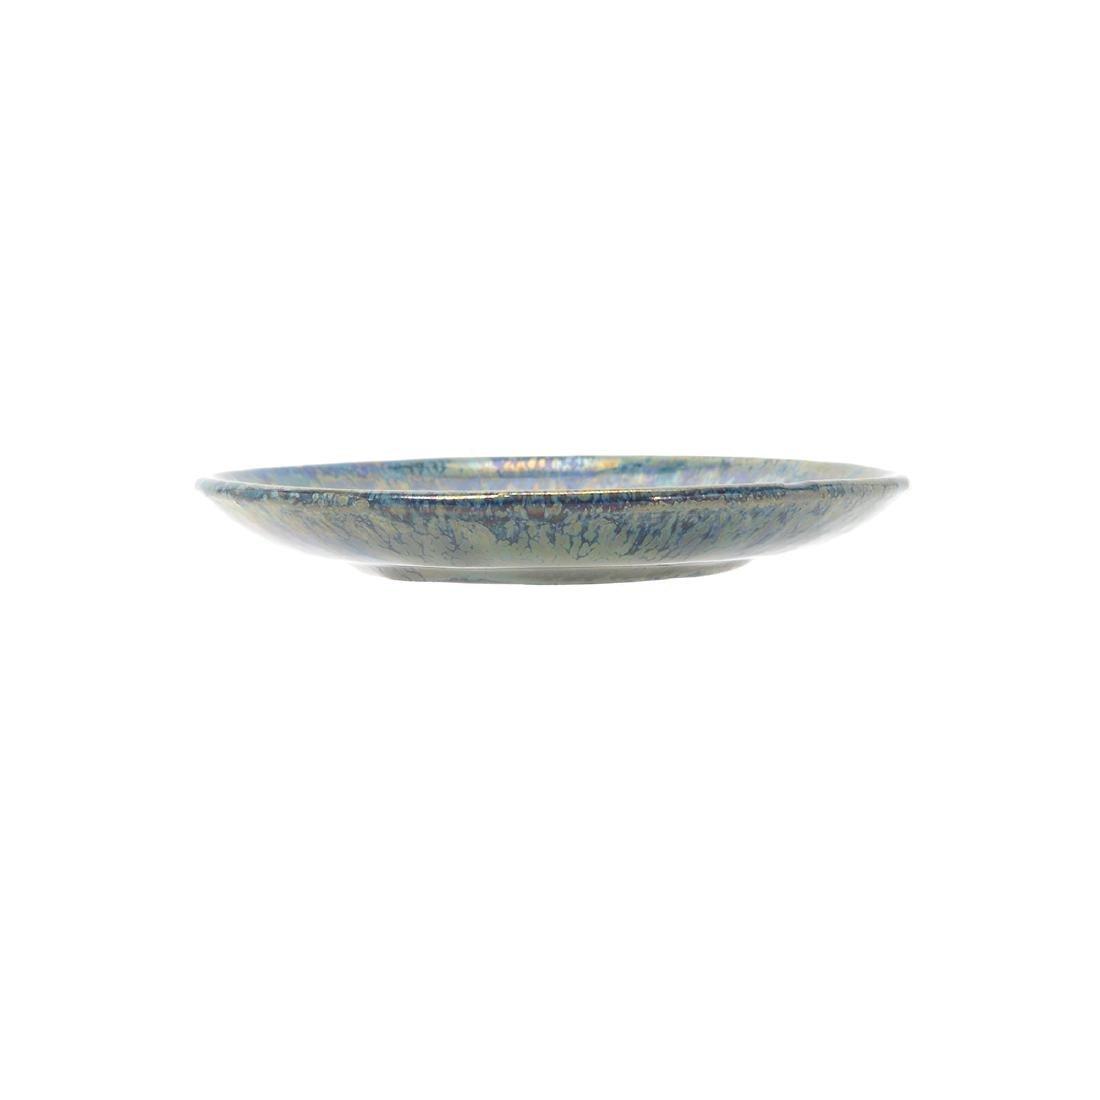 Alphonse Cytere Iridescent Art Pottery Tea Service - 6